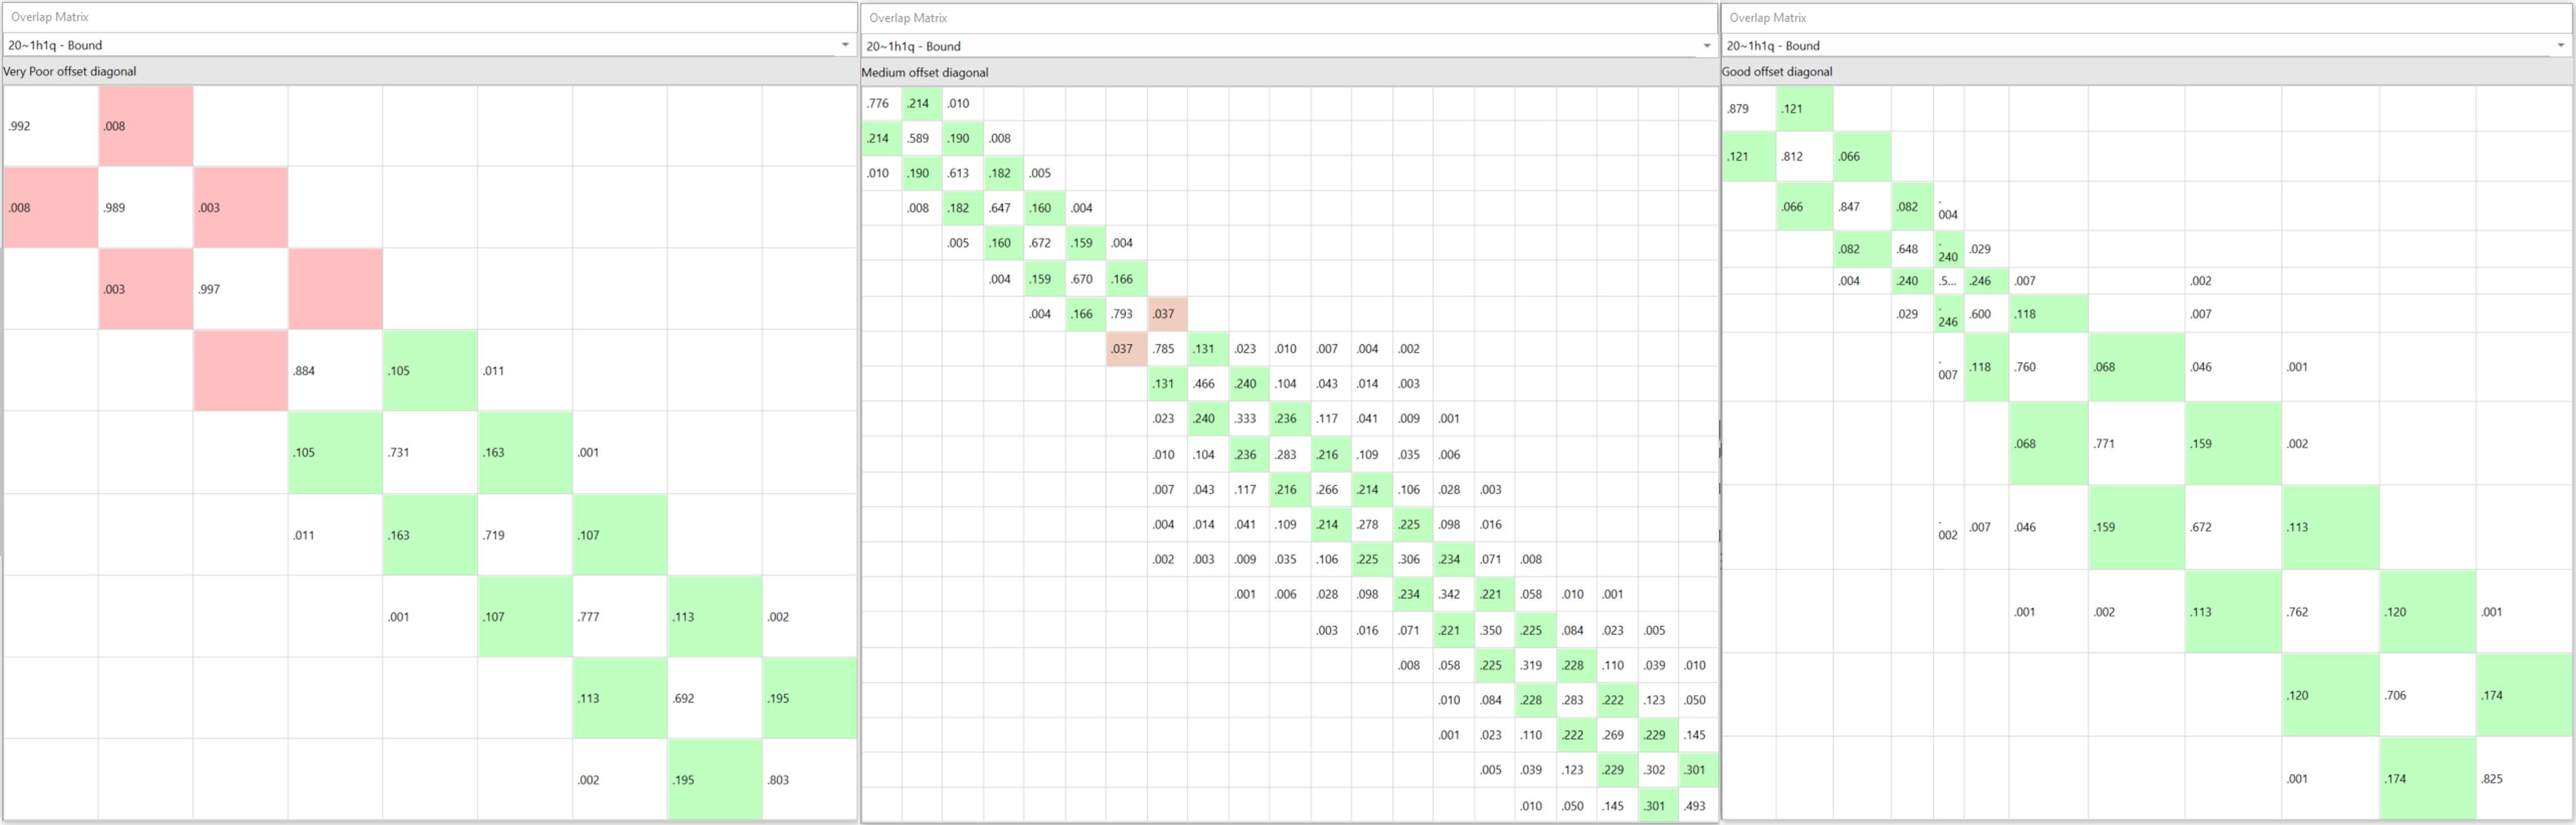 Figure 2. Comparison between under-sampling, over-sampling and adaptive Lambda scheduling